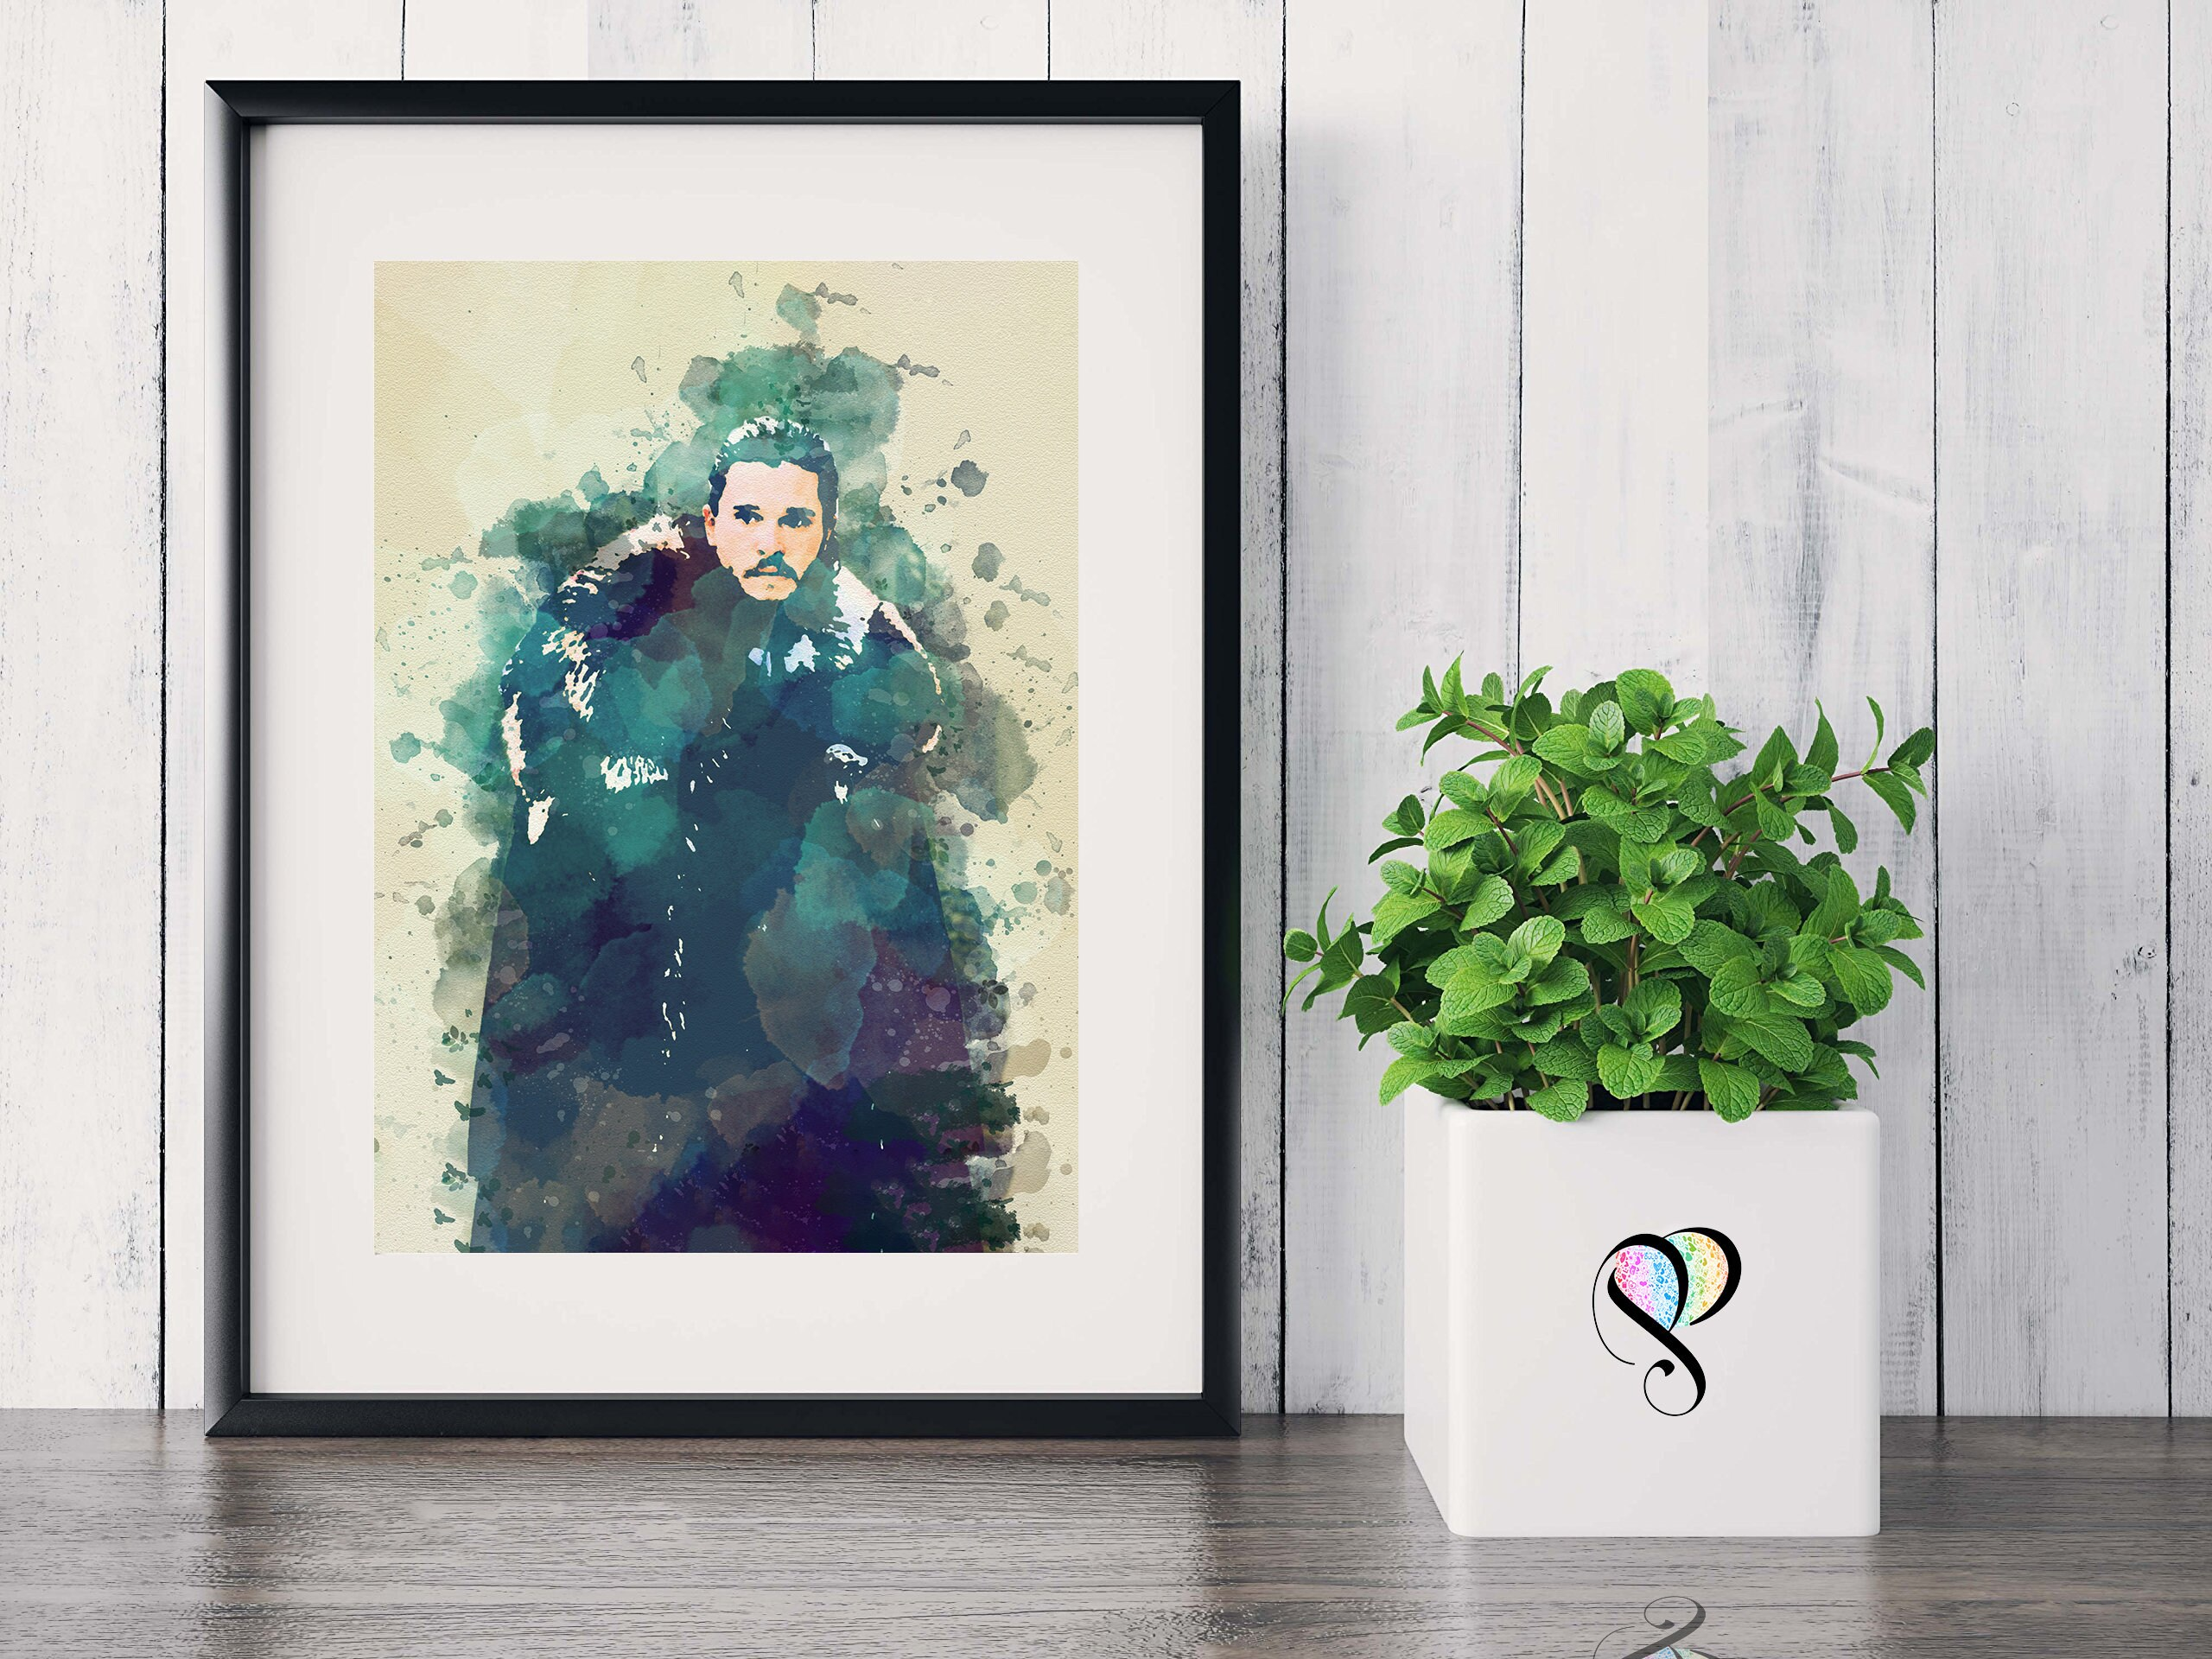 A0 A1 A2 A3 A4 Sizes Game Of Thrones Jon Snow Kit Harington Poster Art Print